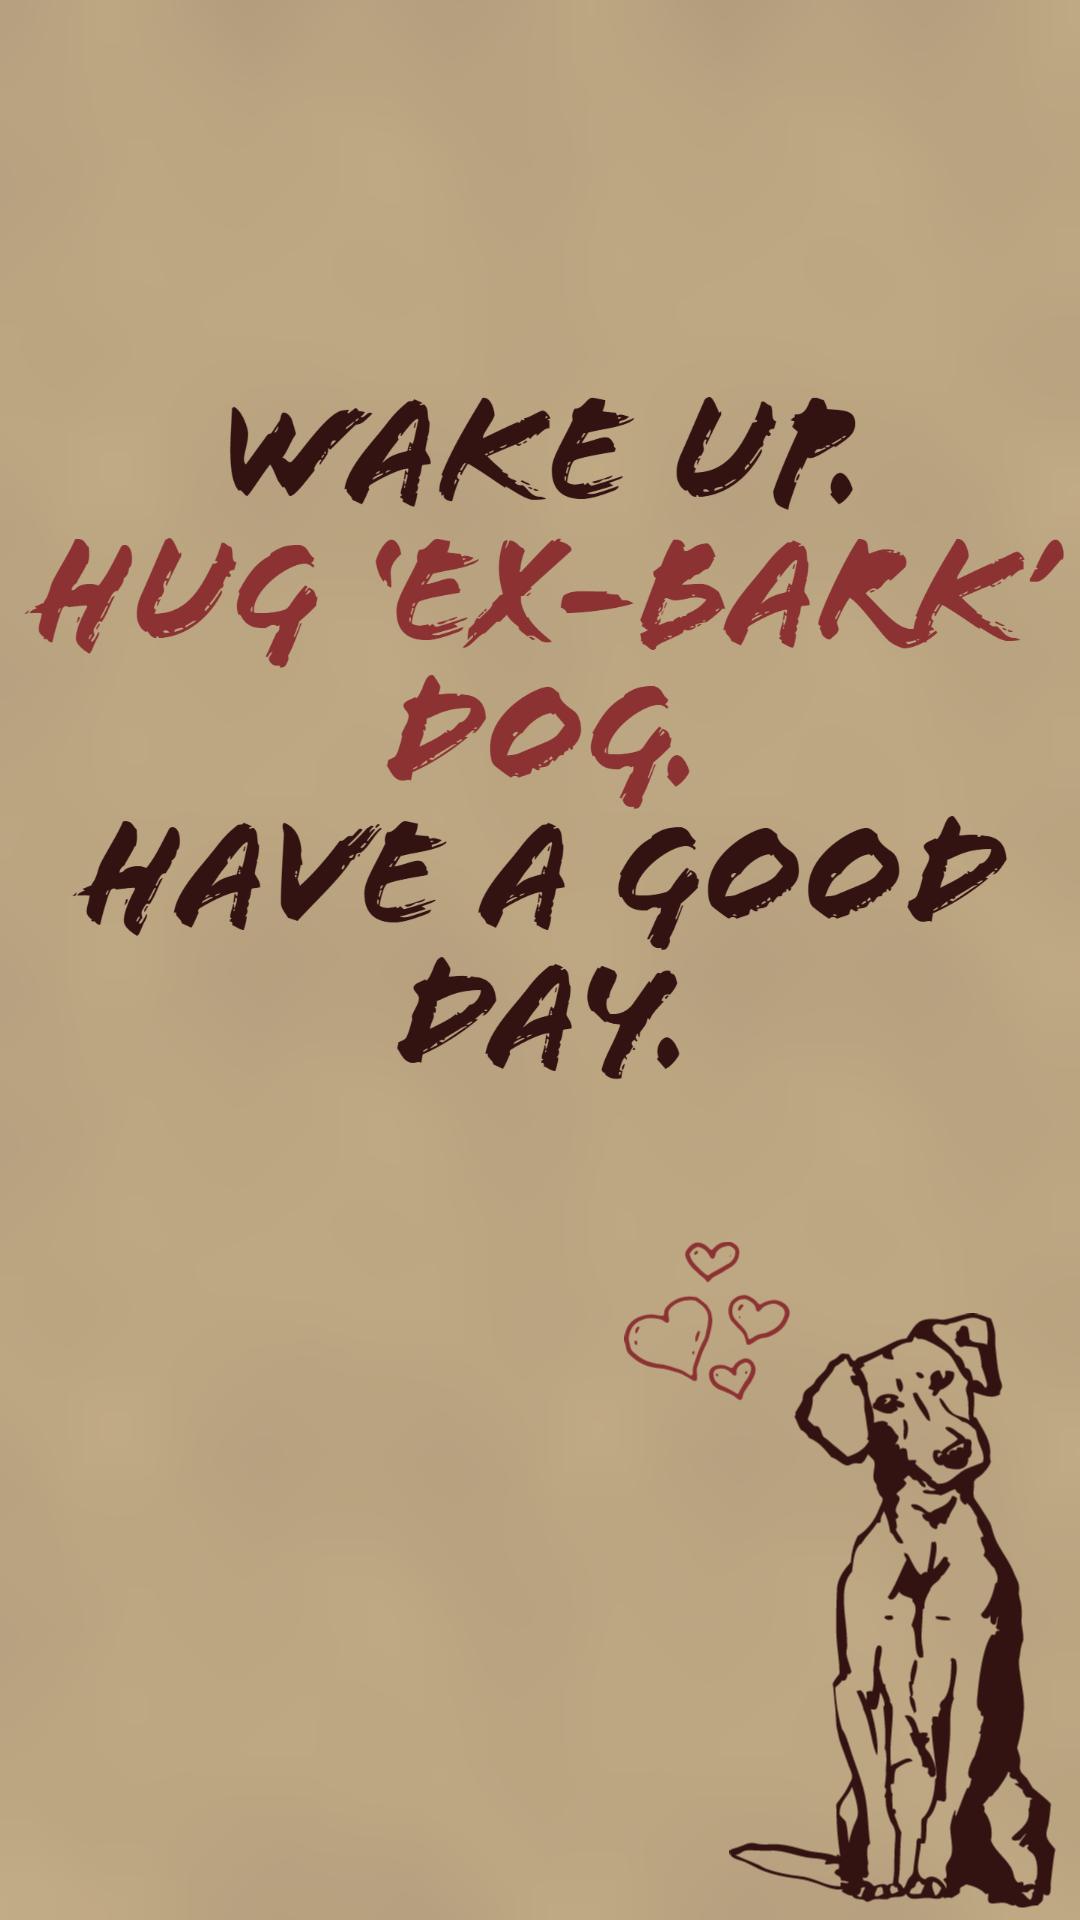 EX-Bark